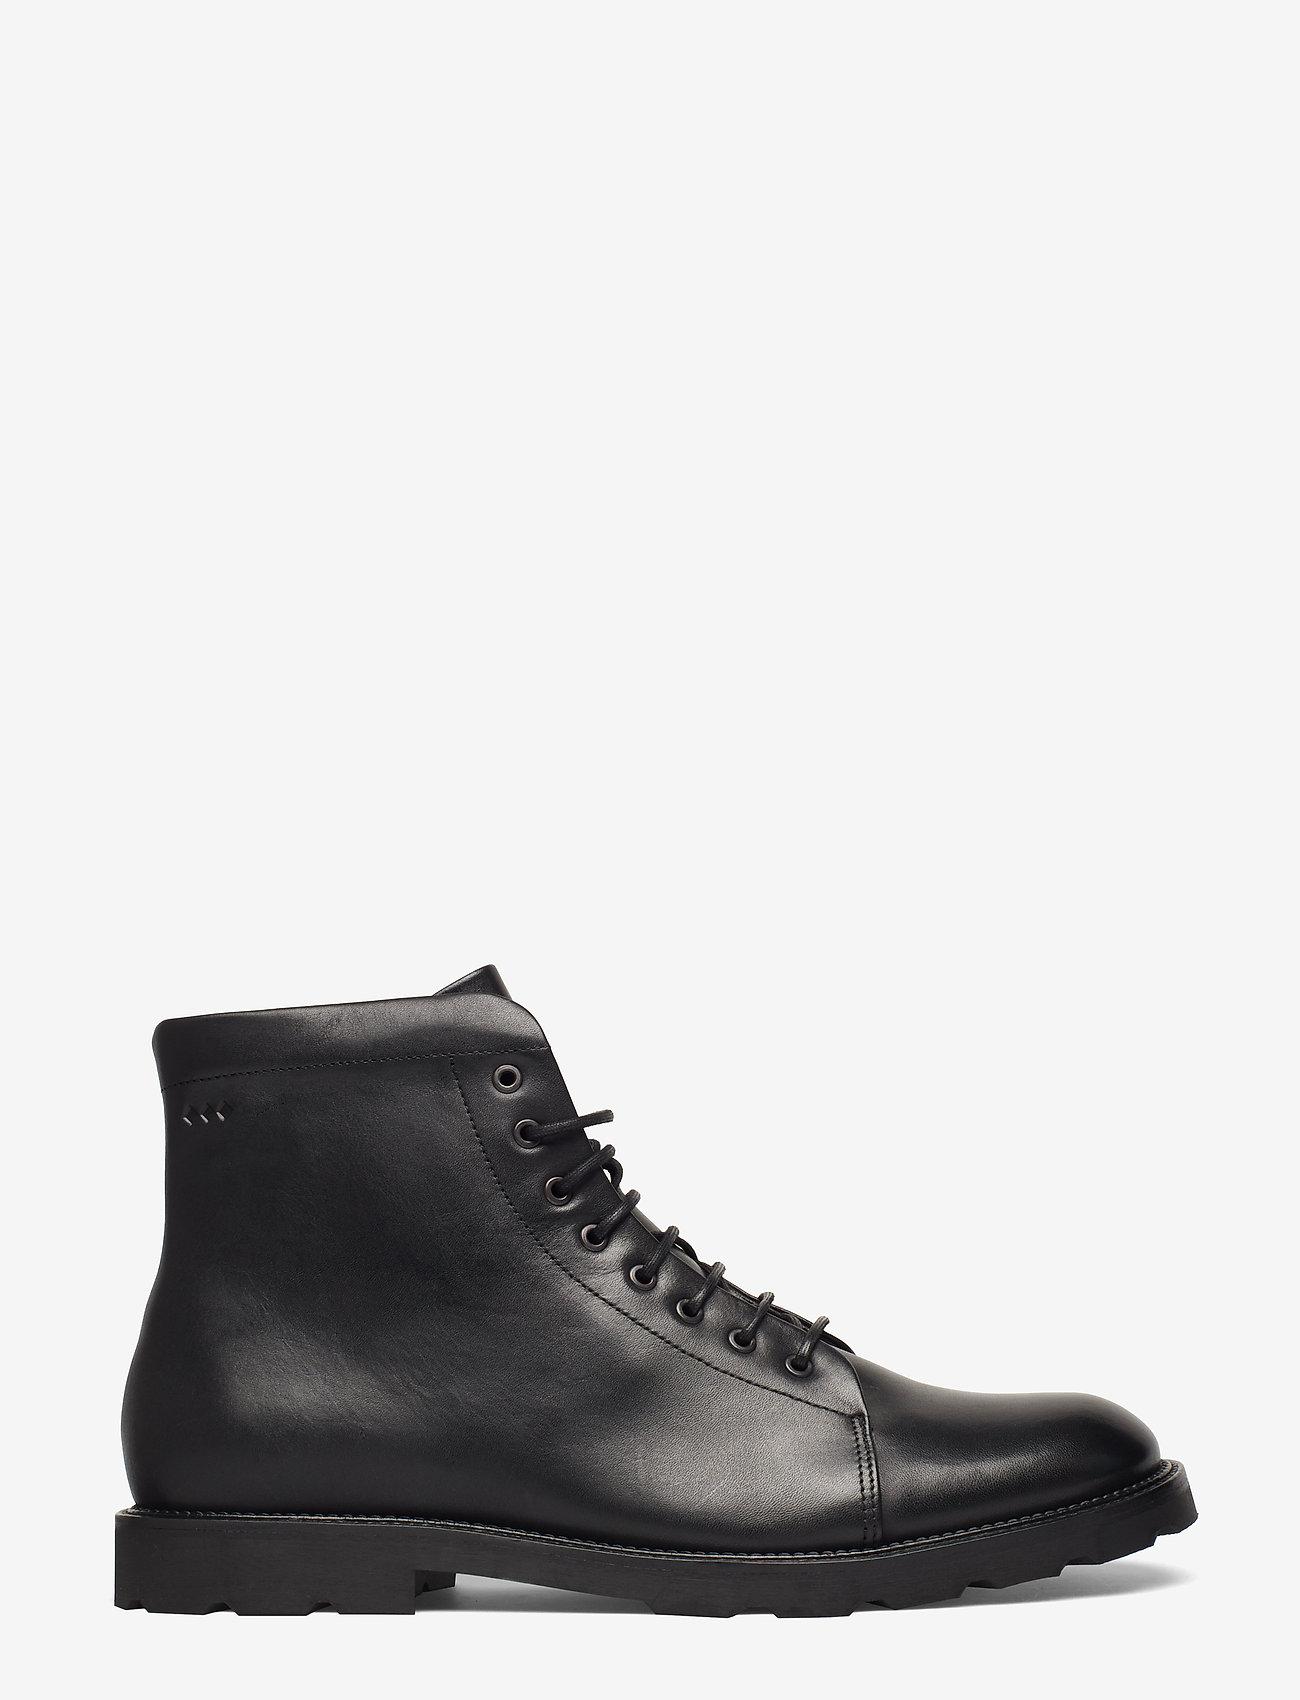 Royal Republiq Alias Hiker High Cut - Boots